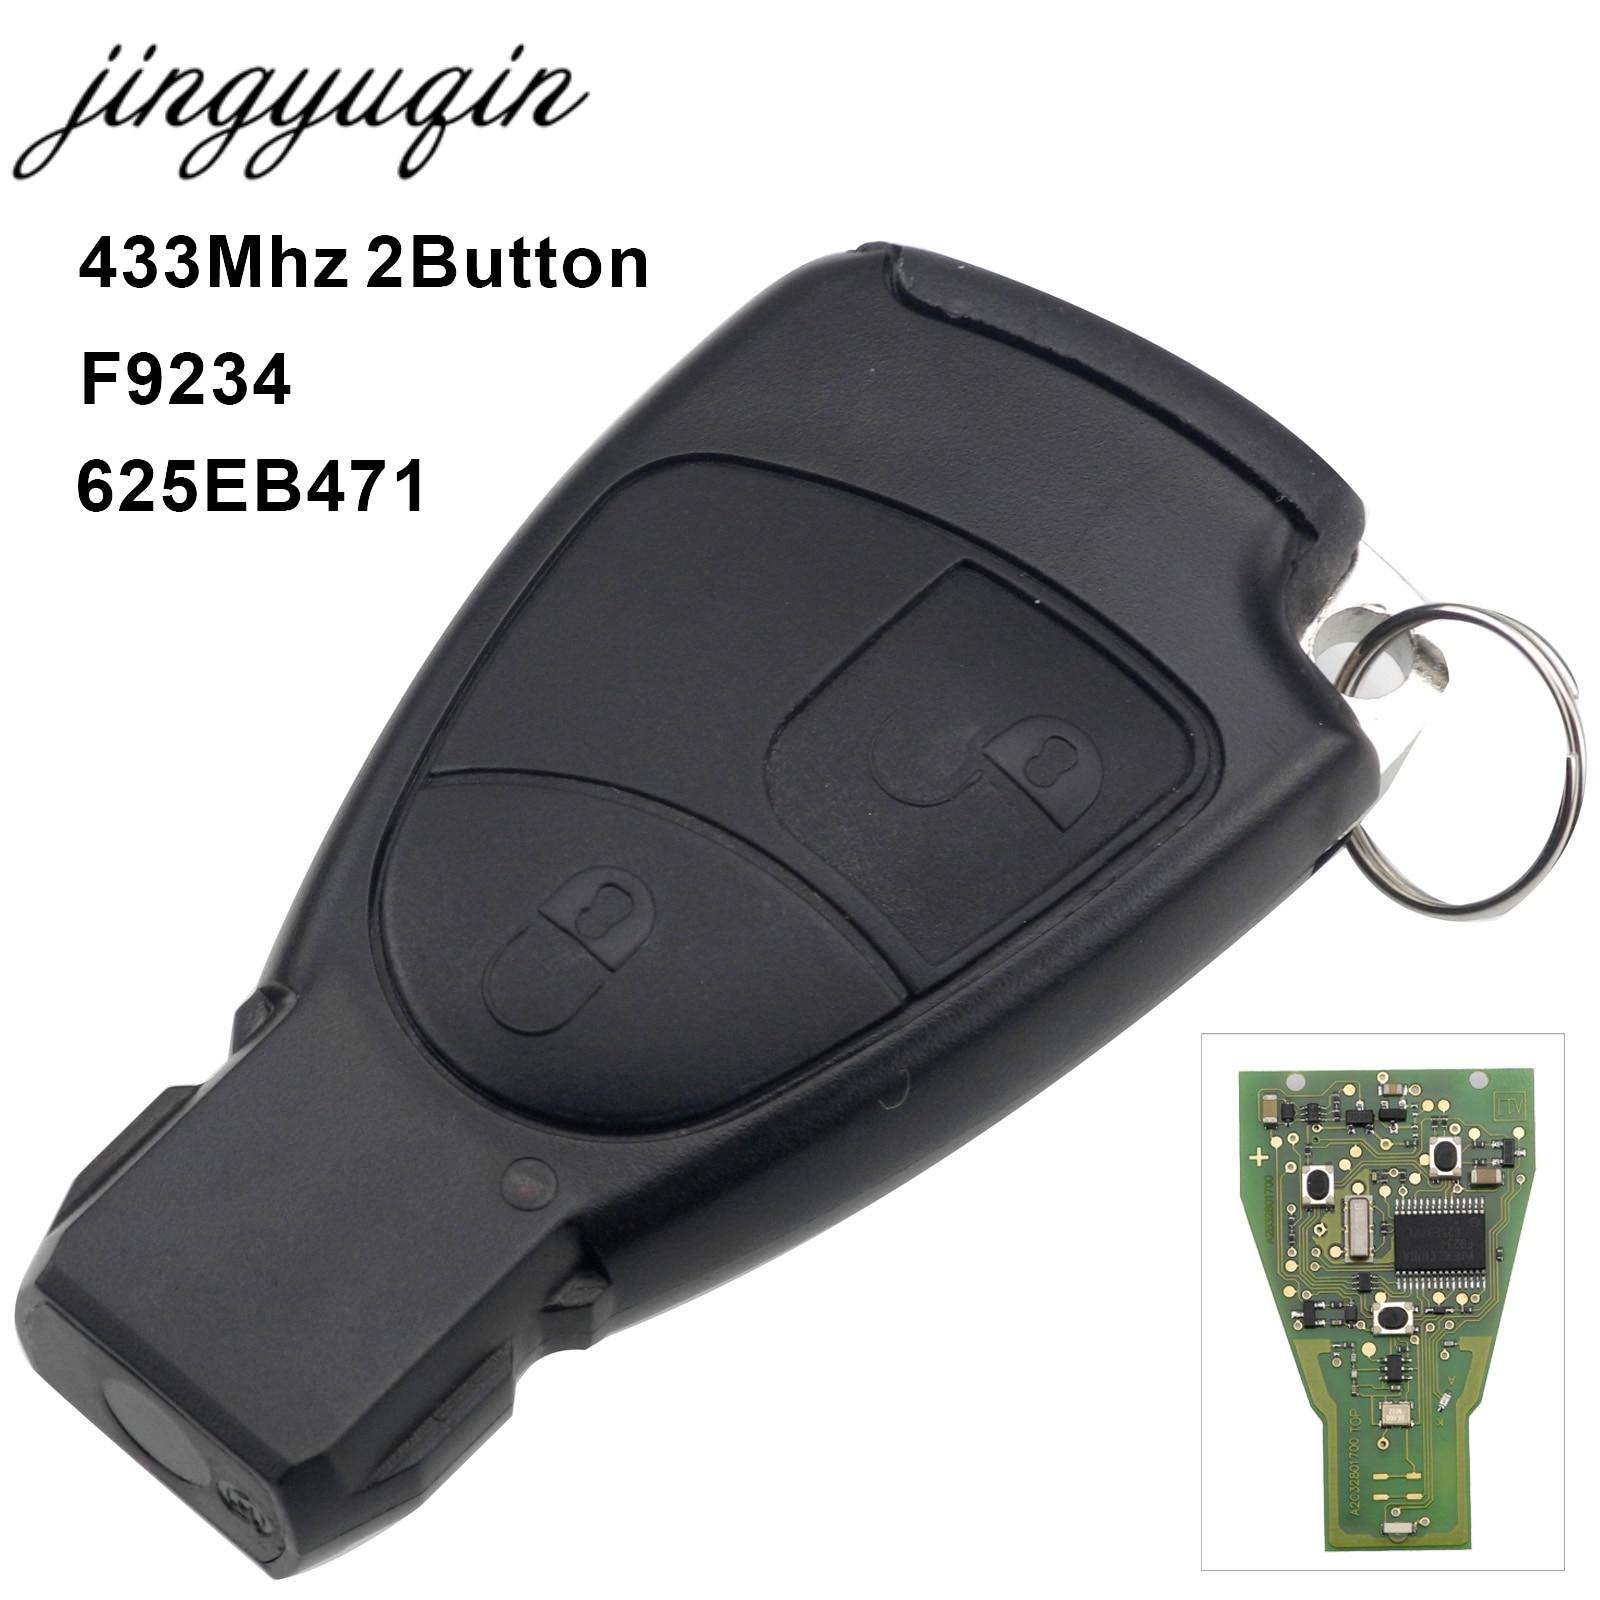 jingyuqin 433Mhz 2 Button Smart Remote Car Key Fob For Mercedes for Benz C E ML Class Sprinter Control Circuit Board Keyless